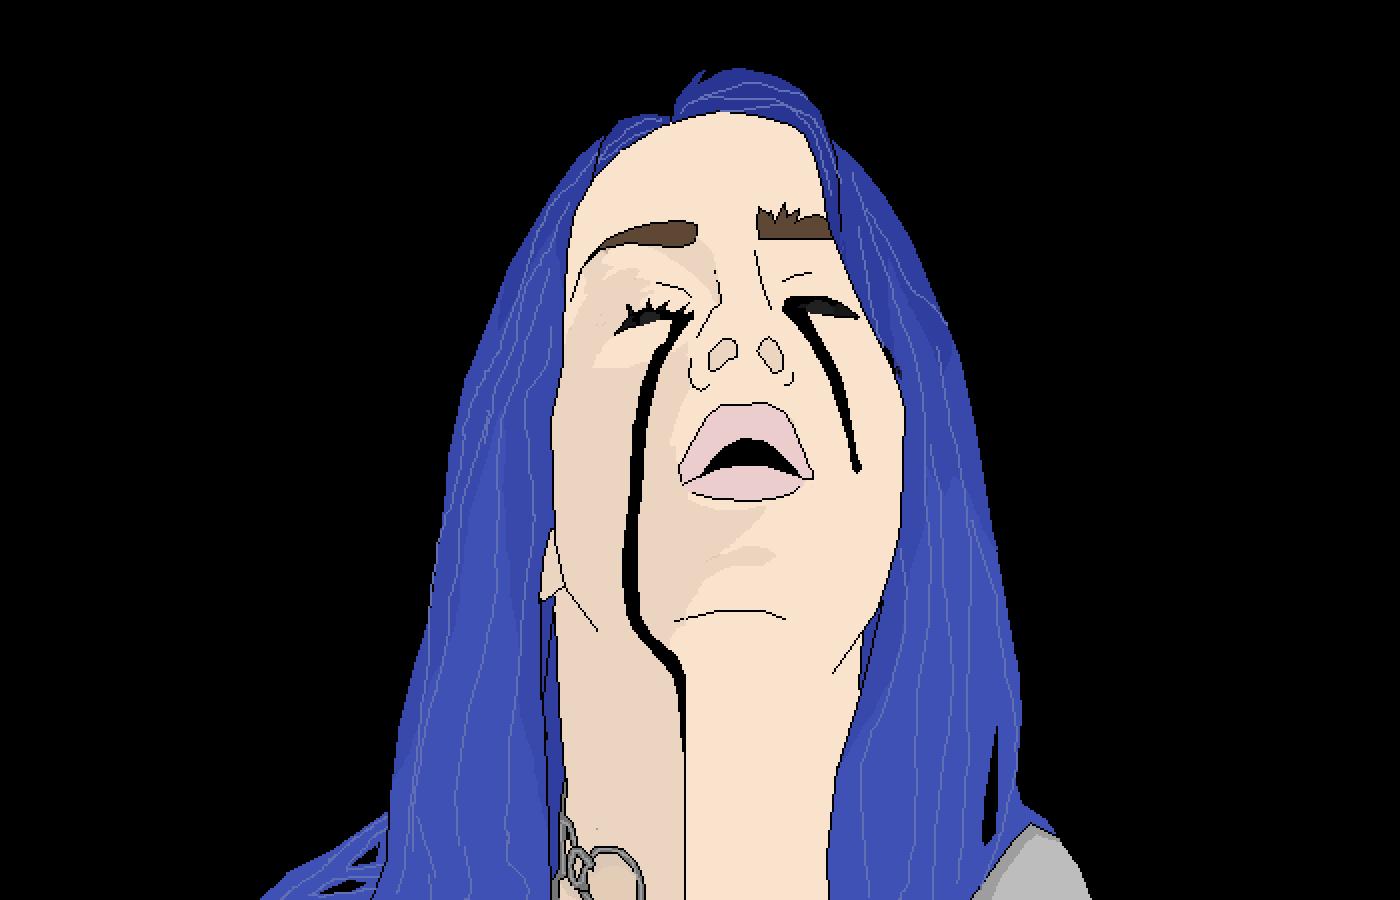 Billie eilish by animegirl2345